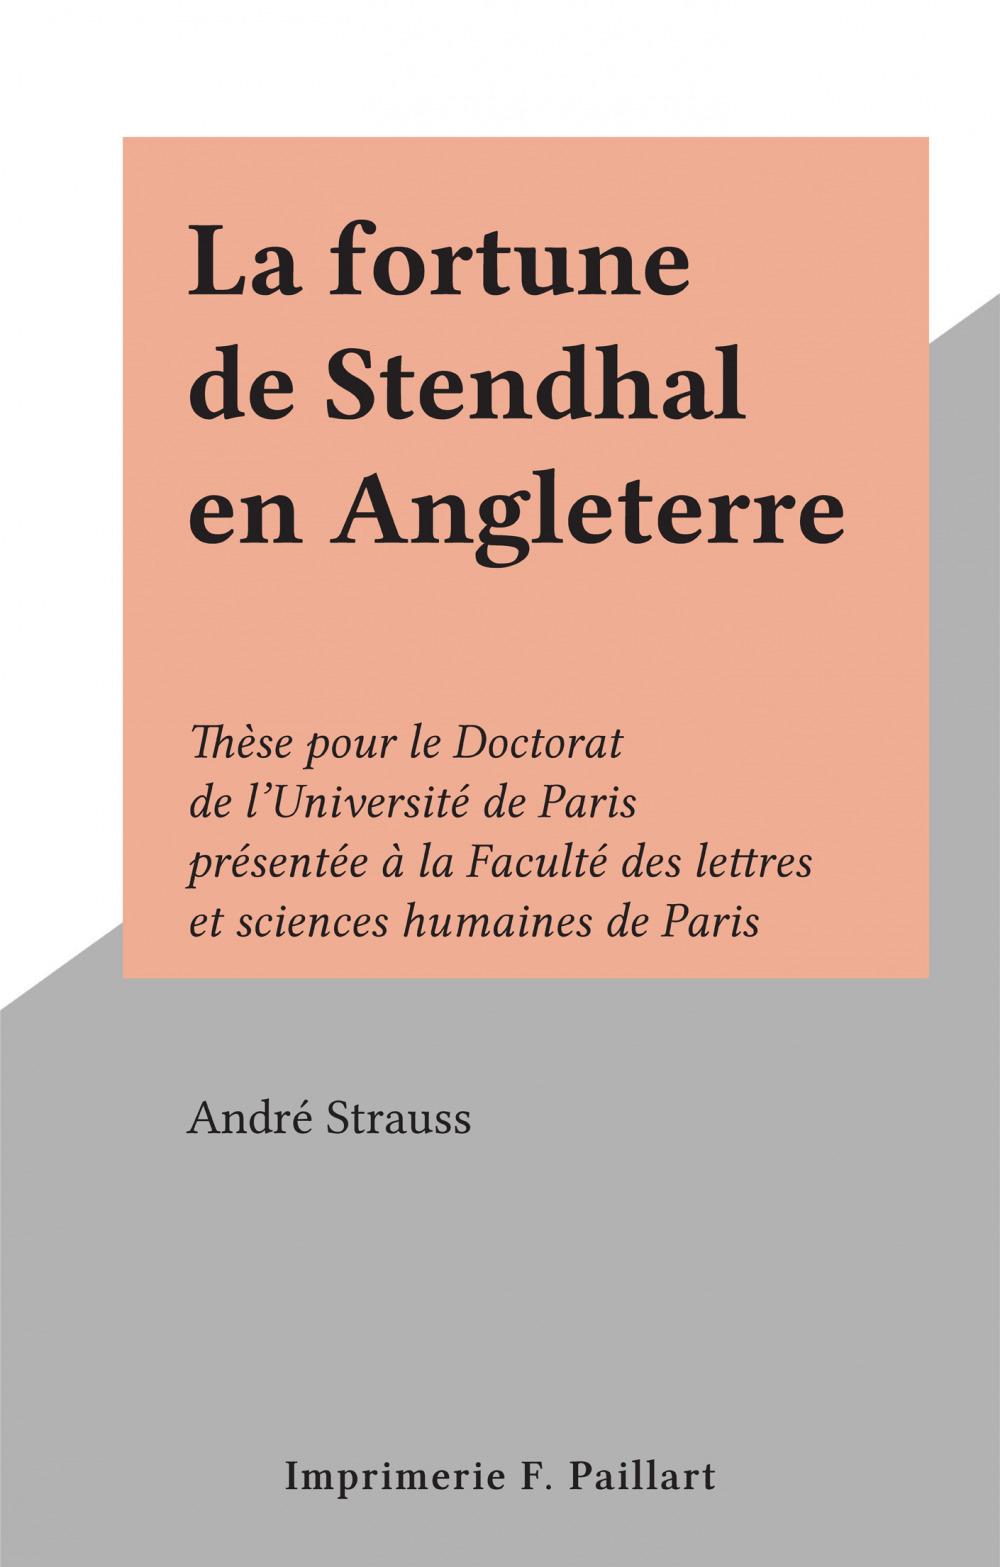 La fortune de Stendhal en Angleterre